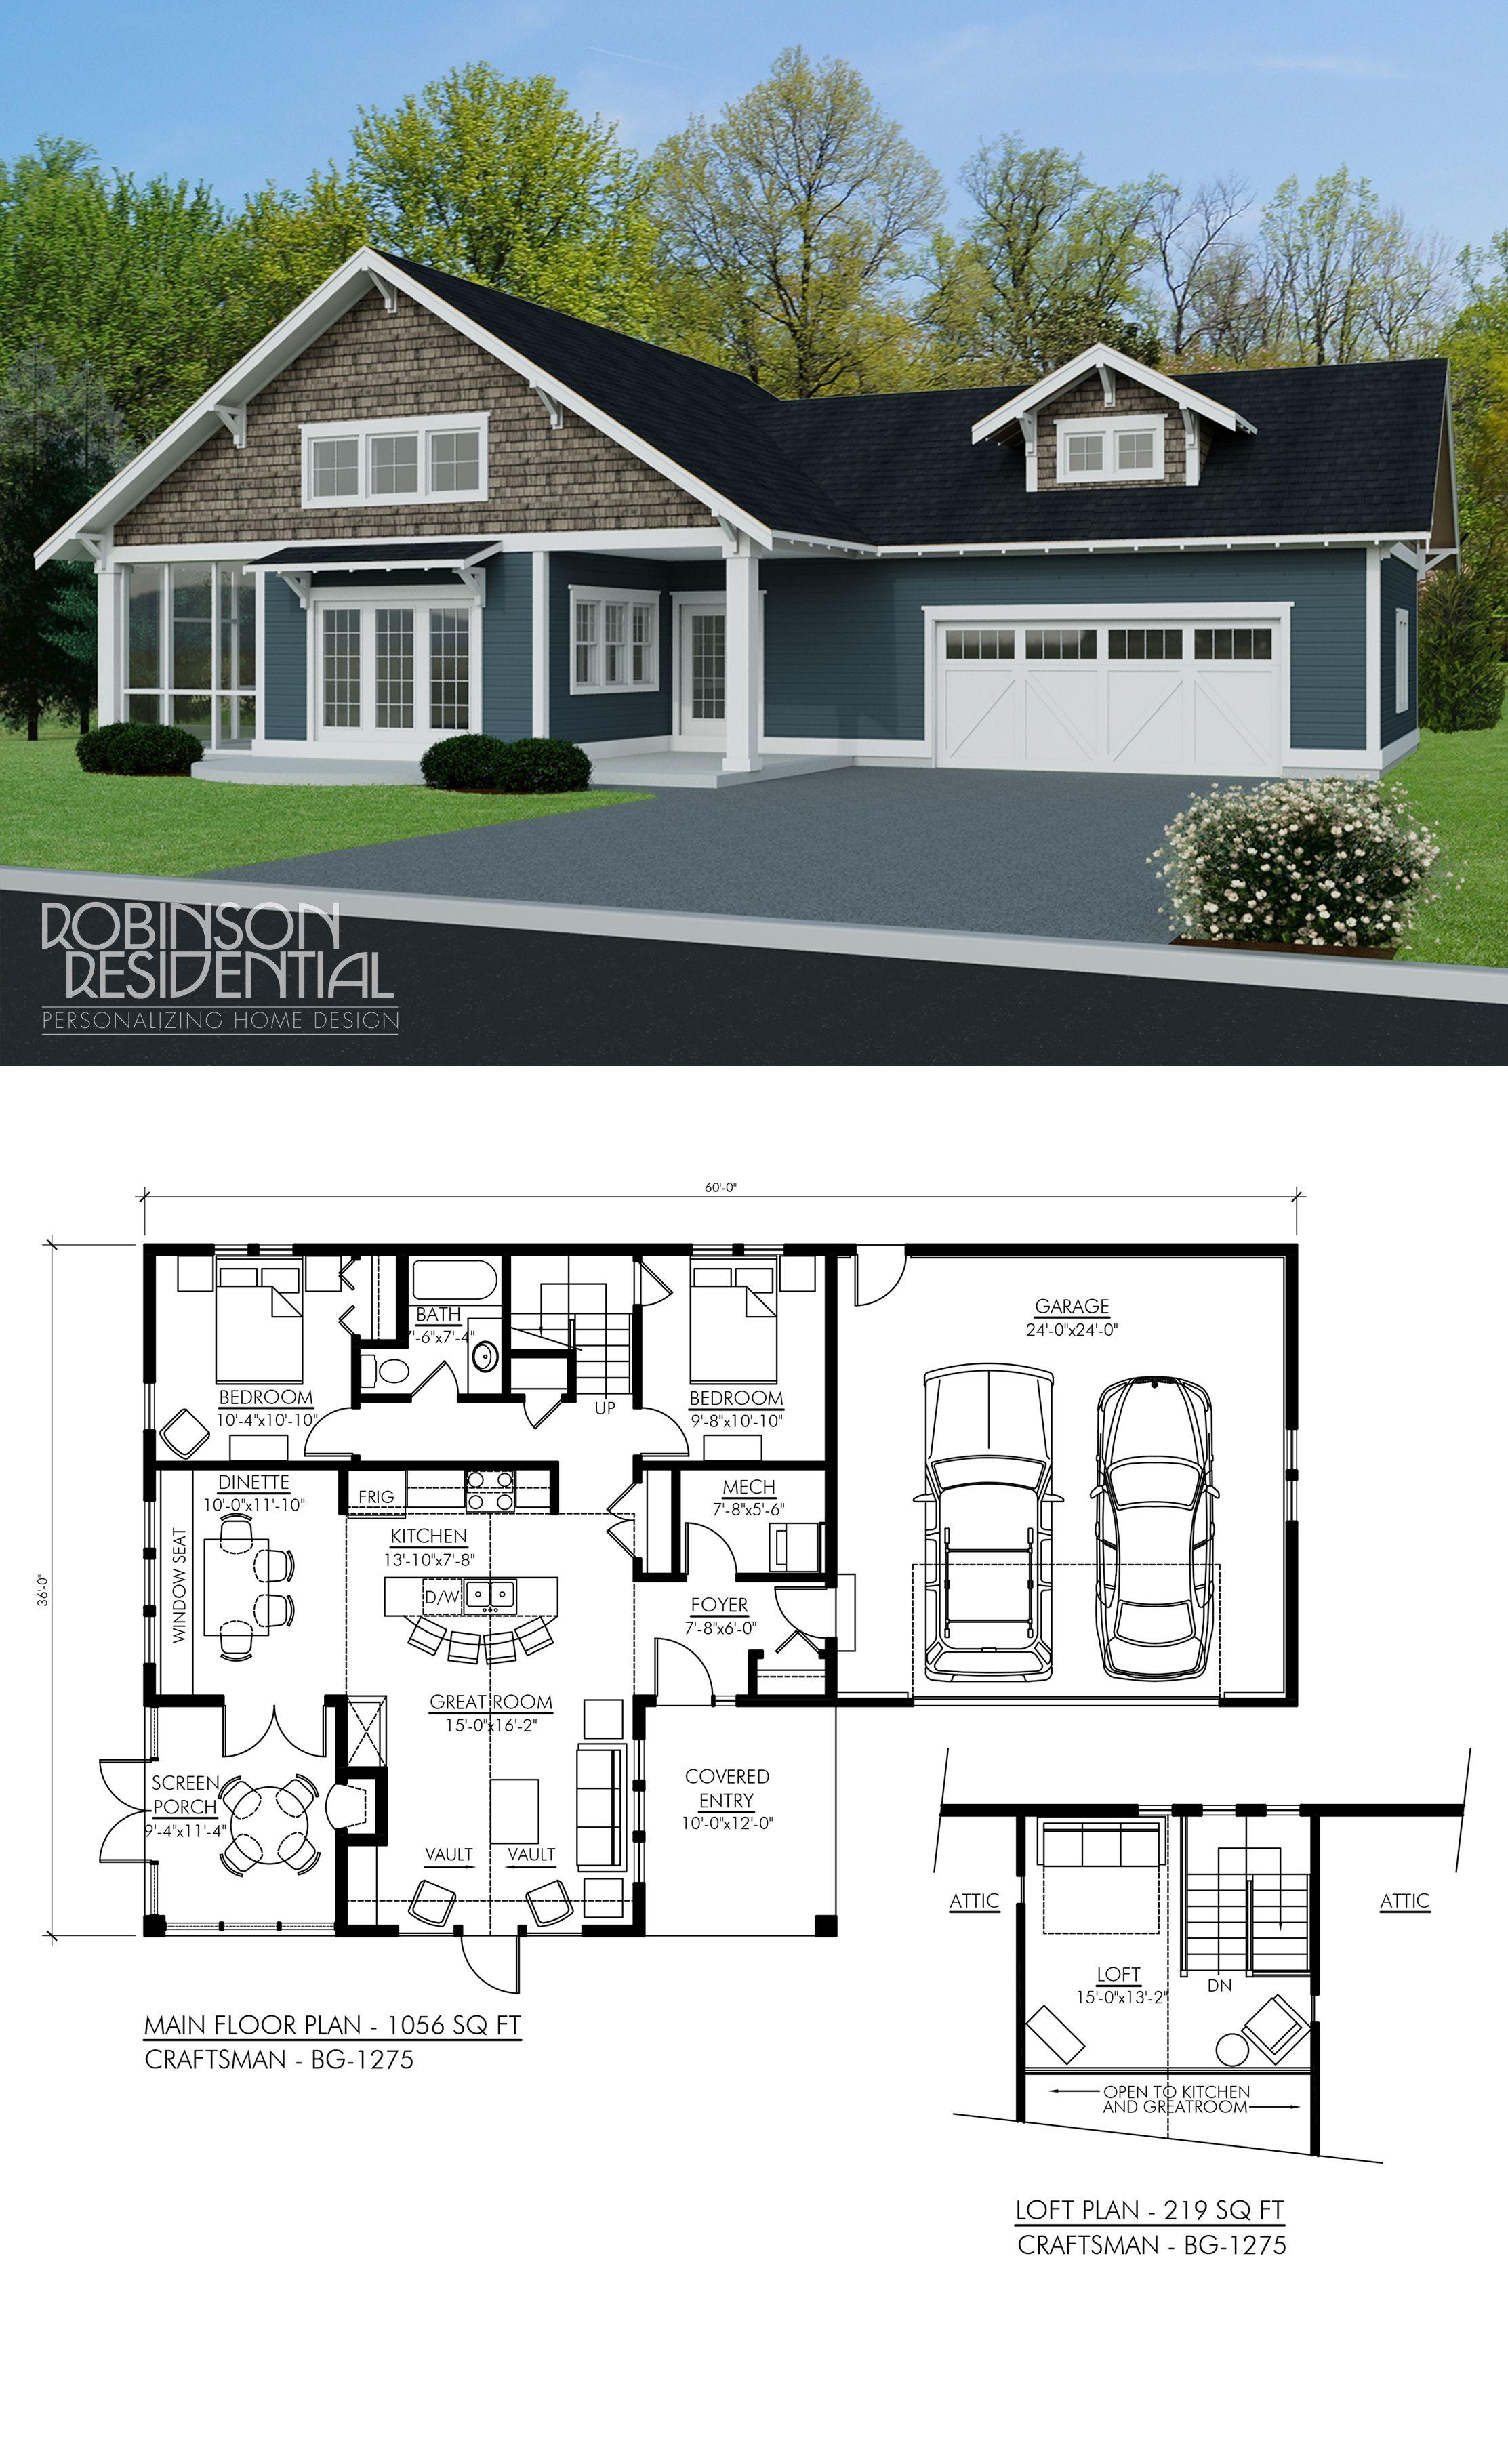 Craftsman House Design Features: Craftsman Home Plans